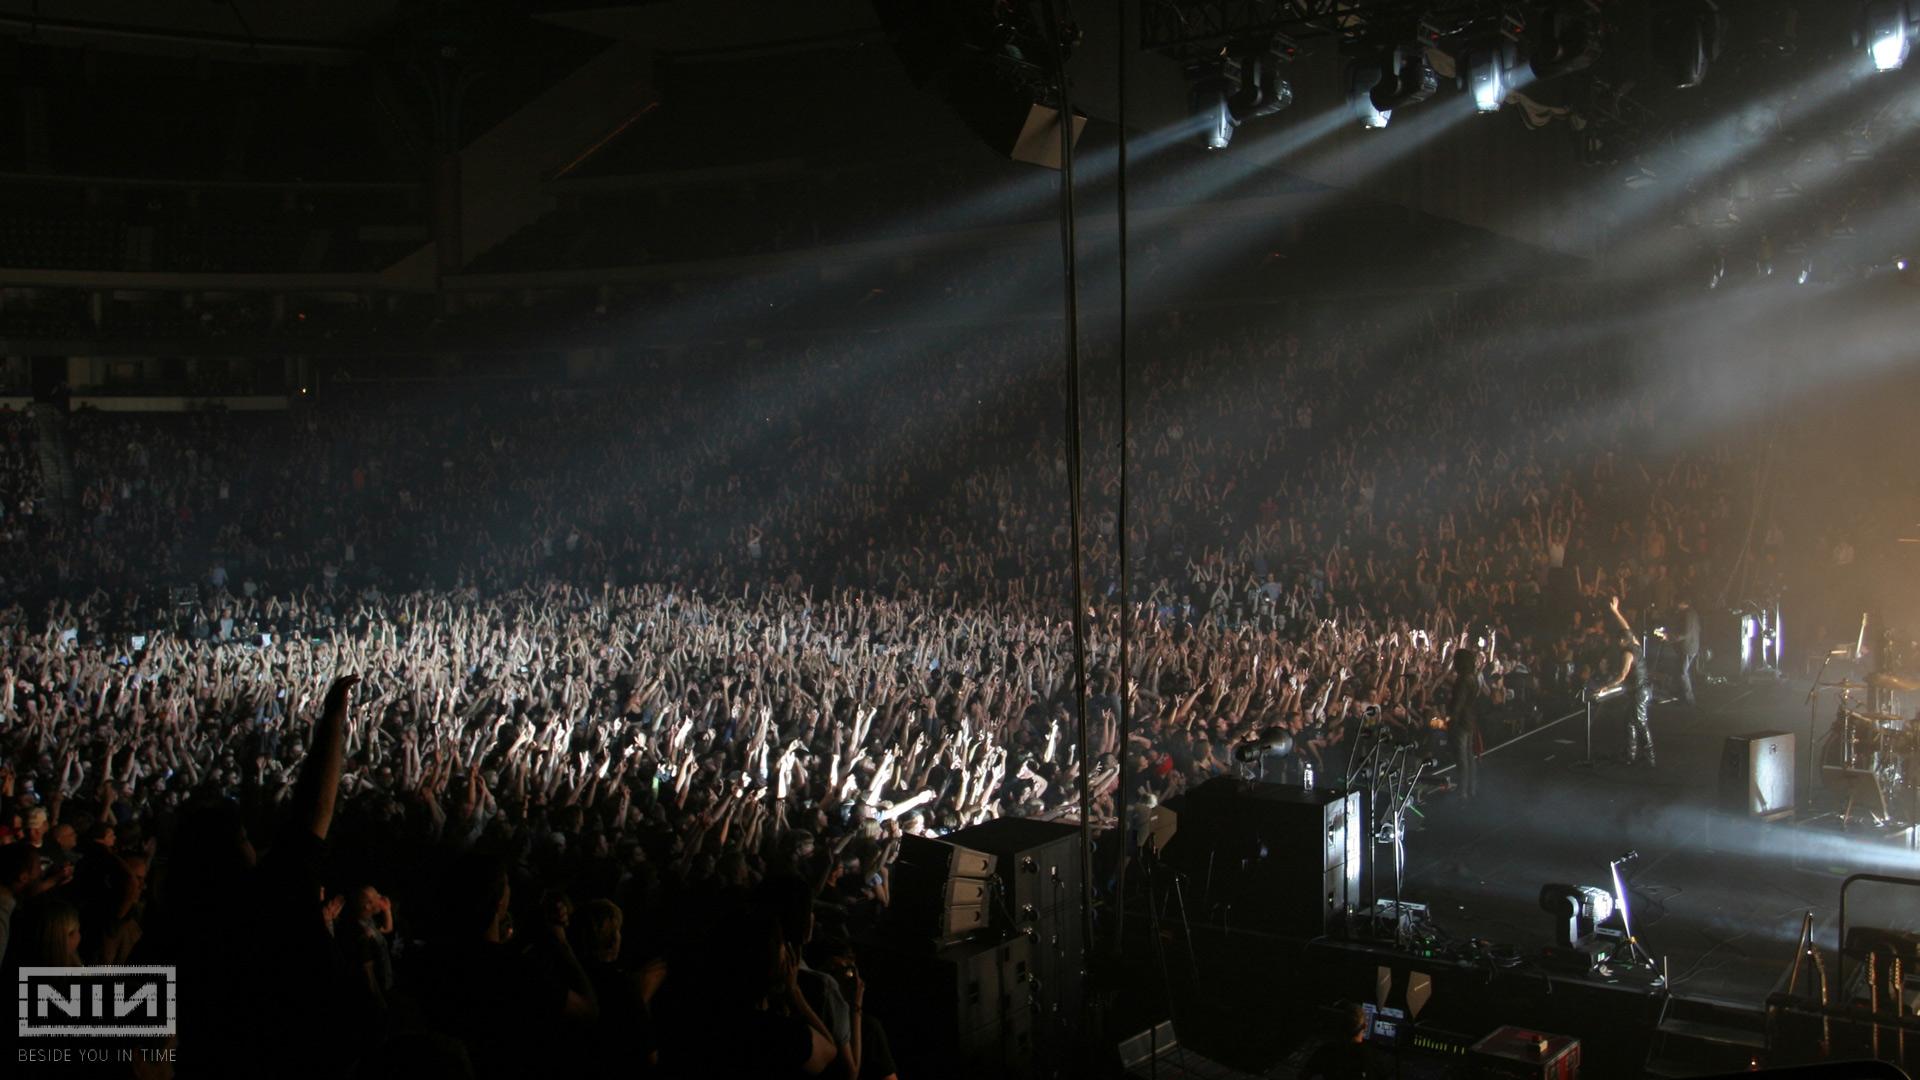 Nine Inch Nails Music Live Free Wallpaper Wallpaperjam Com